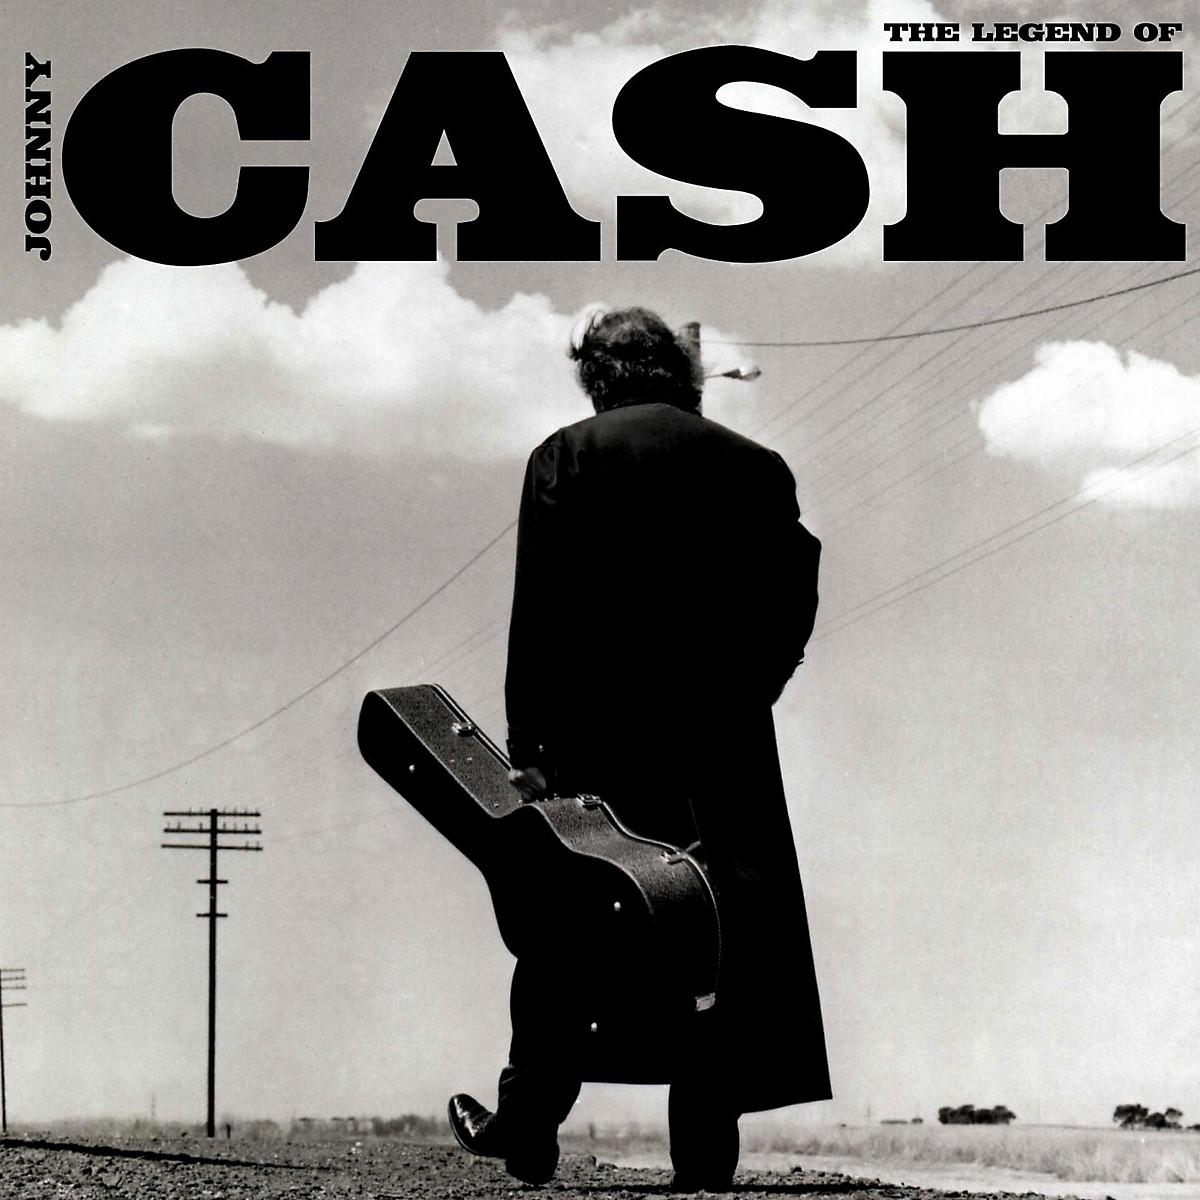 Universal Music Group Johnny Cash - The Legend Of Johnny Cash LP